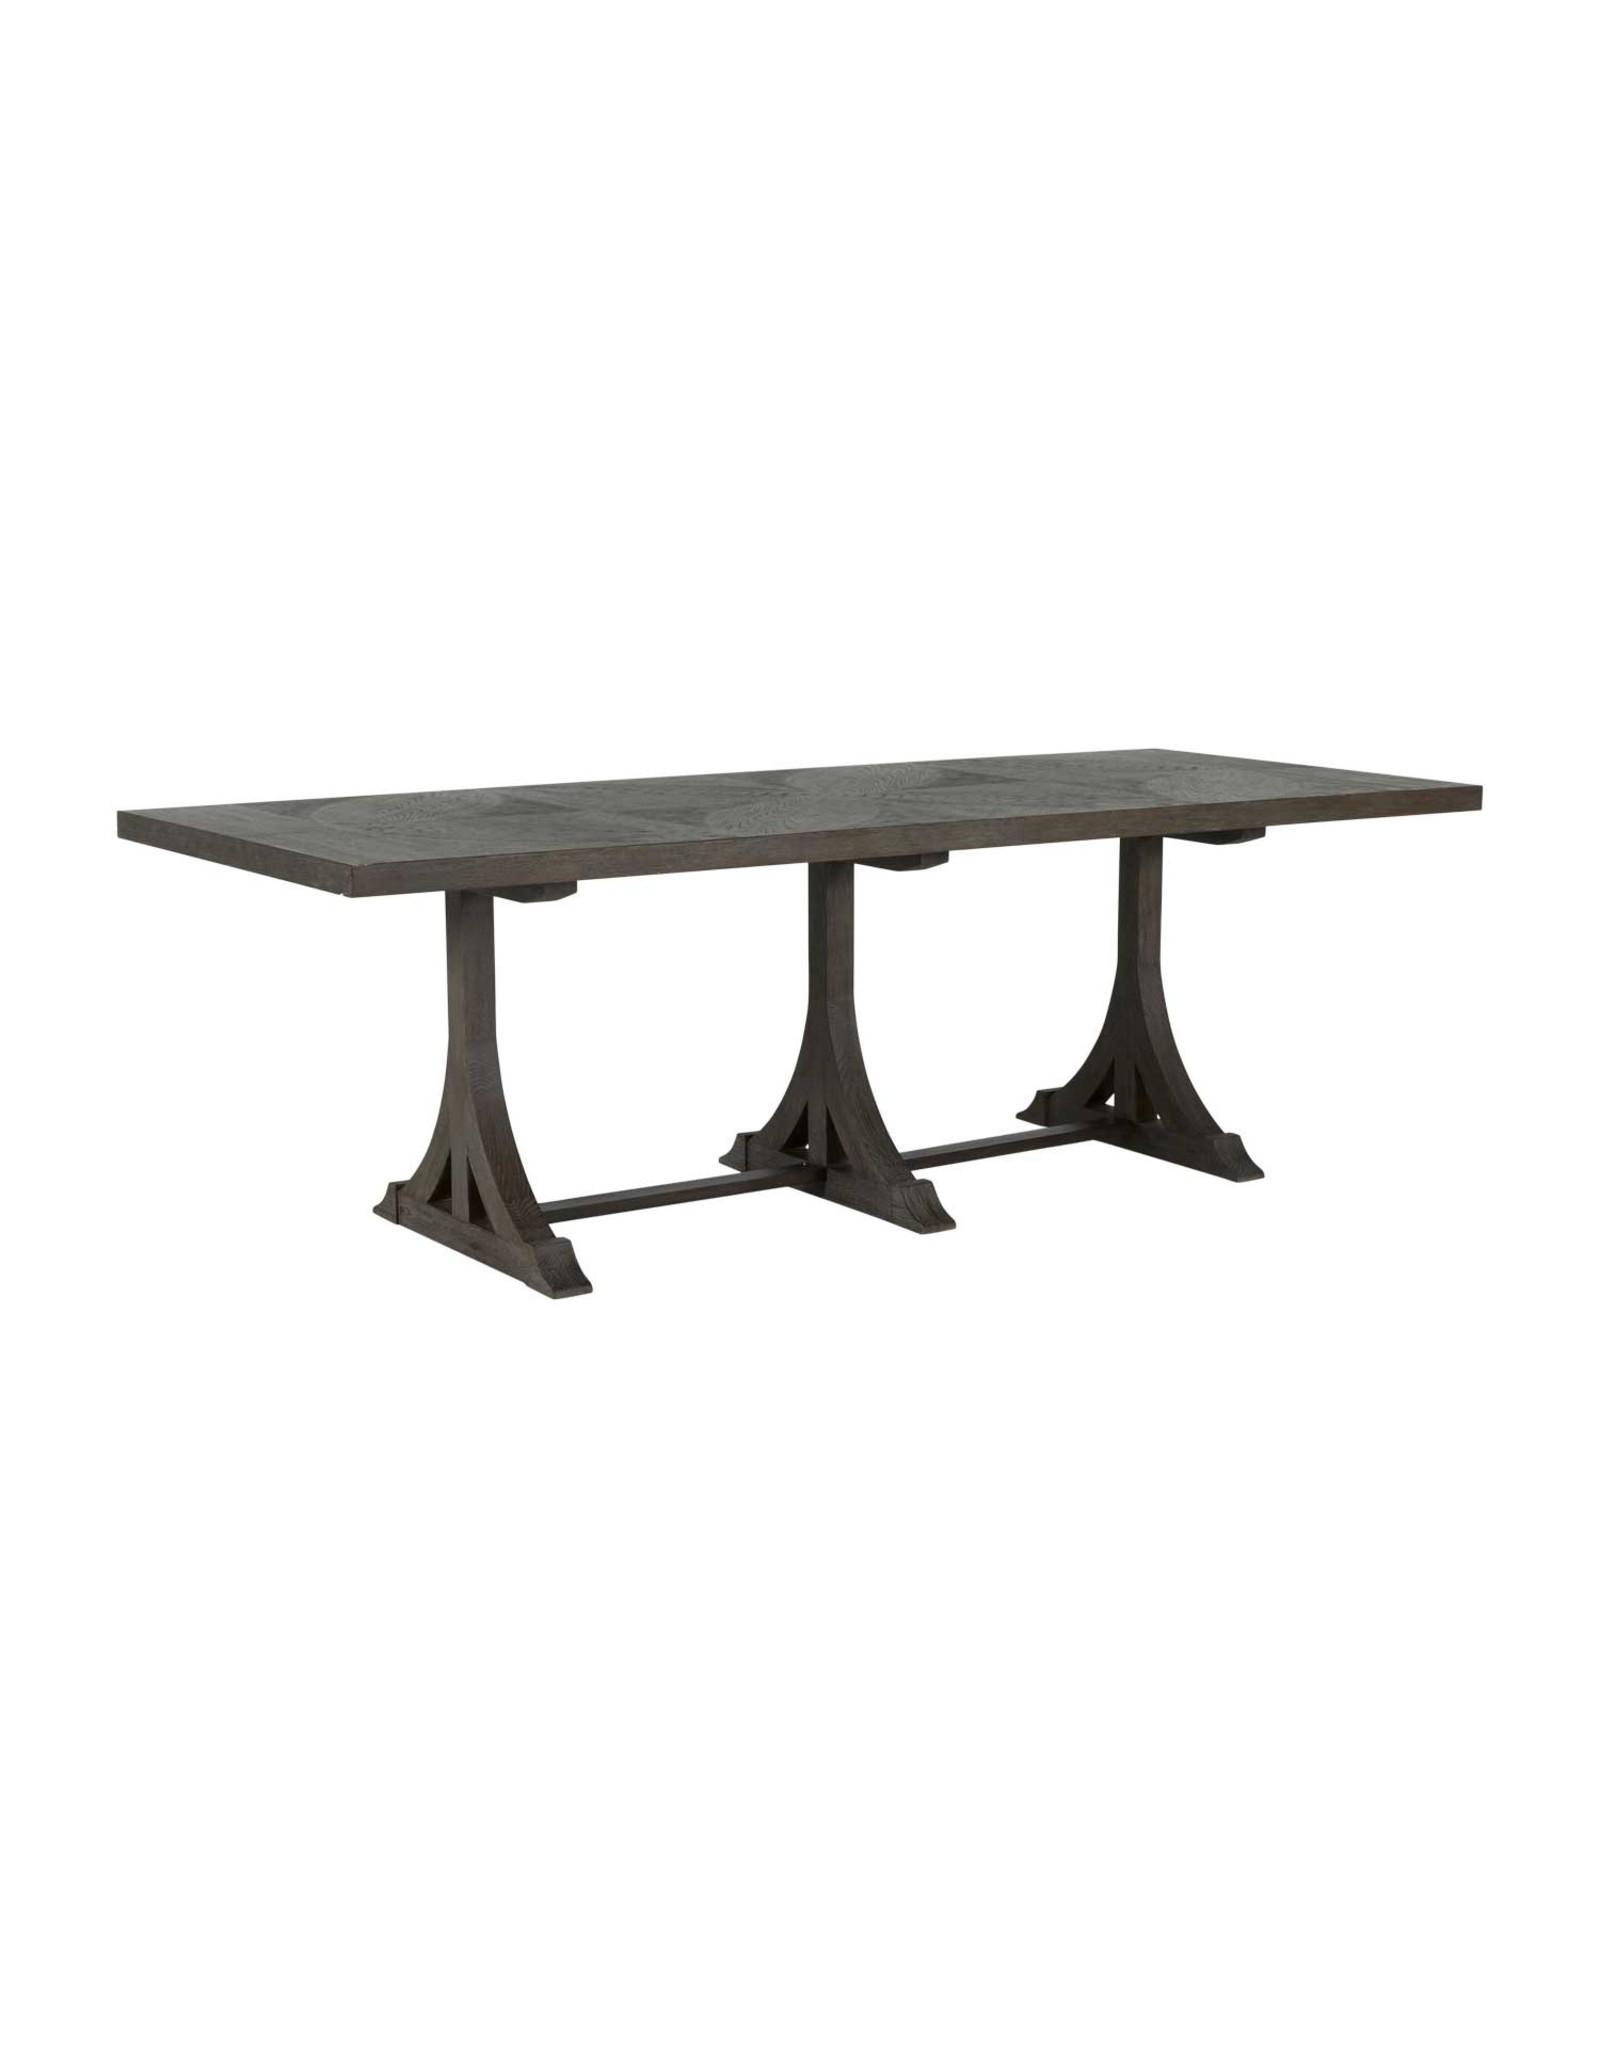 Website Adams Dining Table